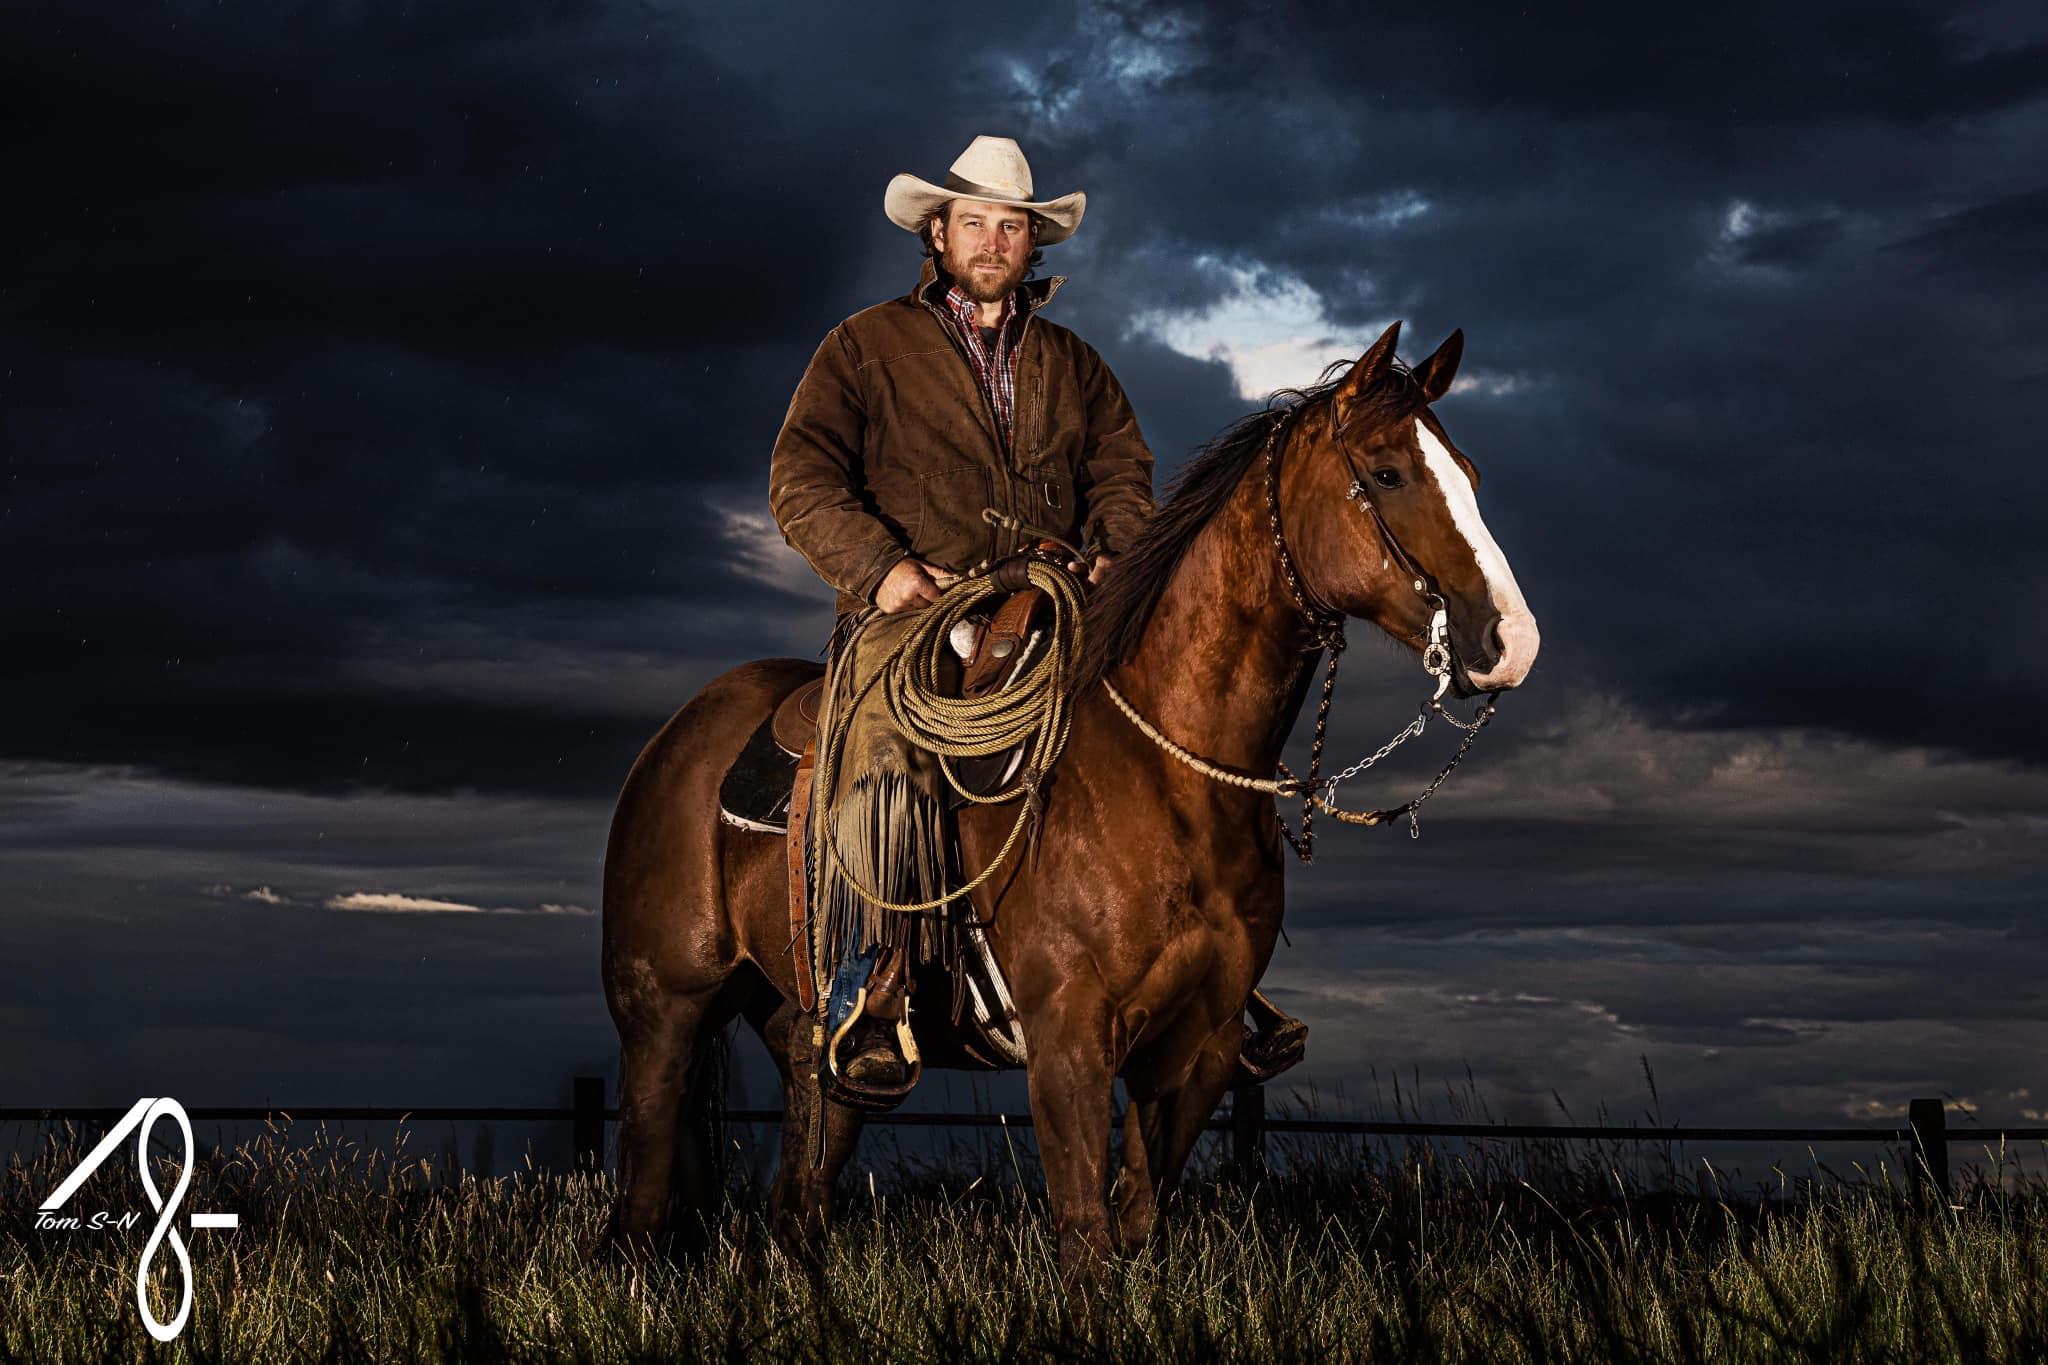 Horsemanship Showcase 2020 - Guy Robertson